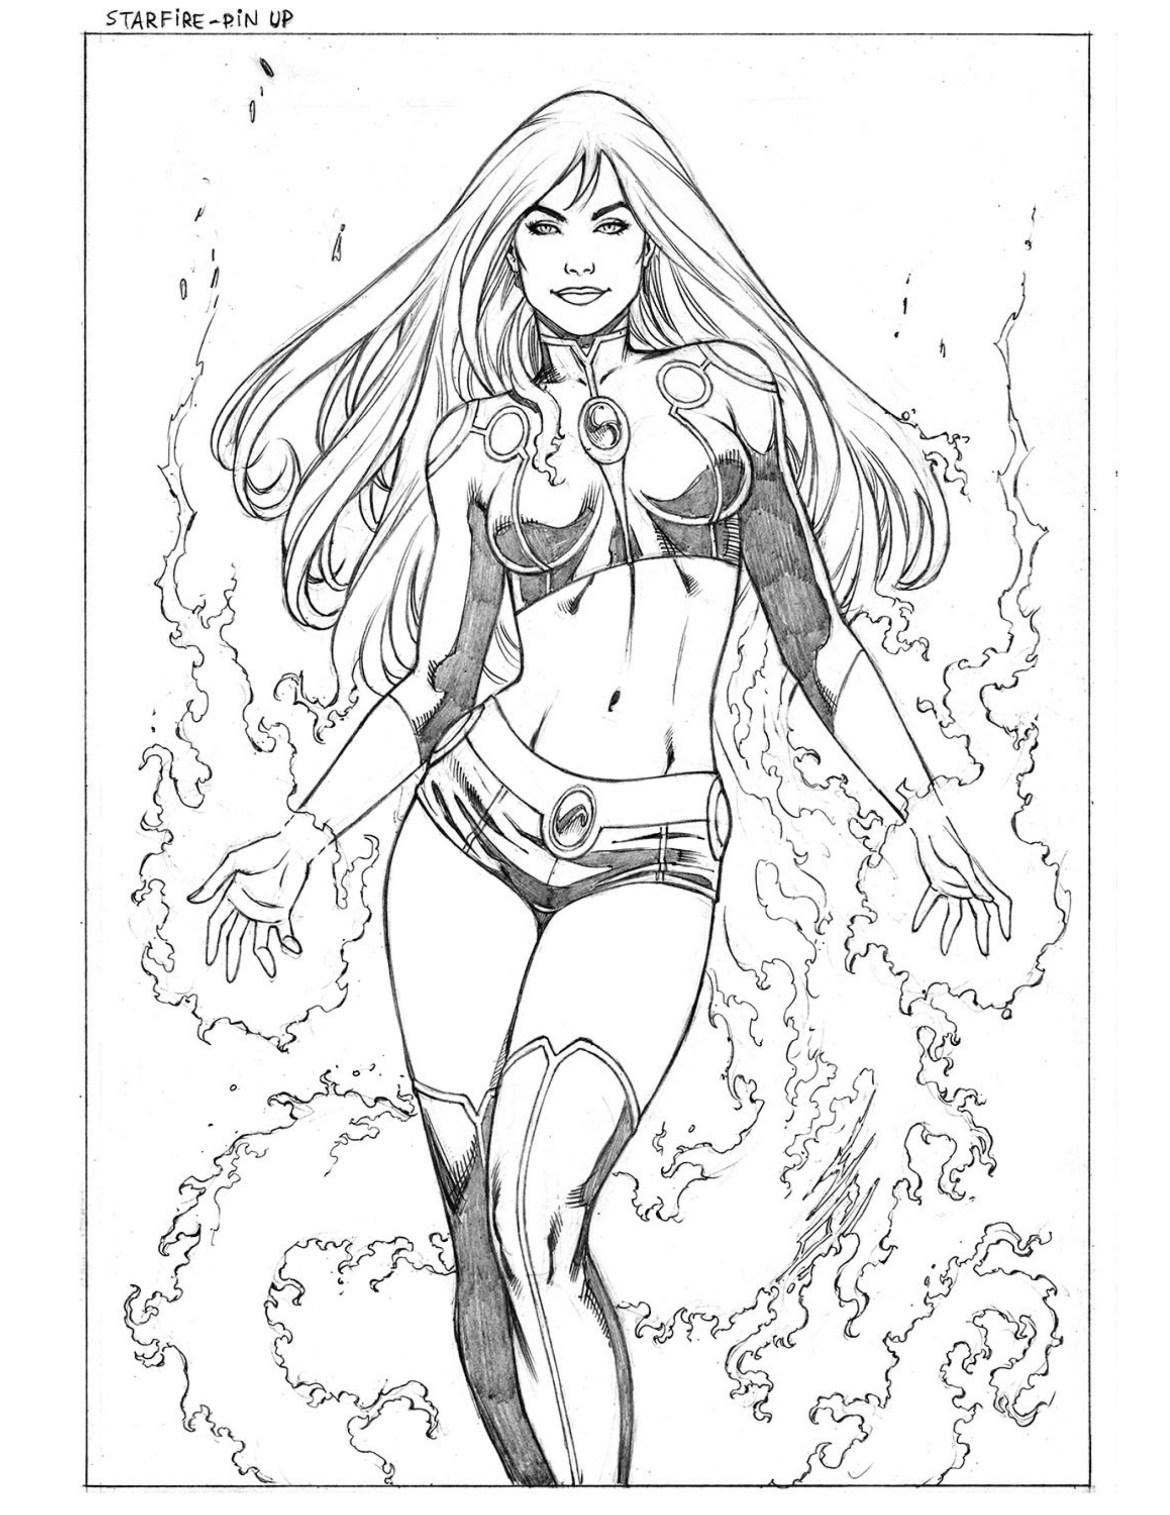 Starfire univers de DC Comics par Walter Geovani